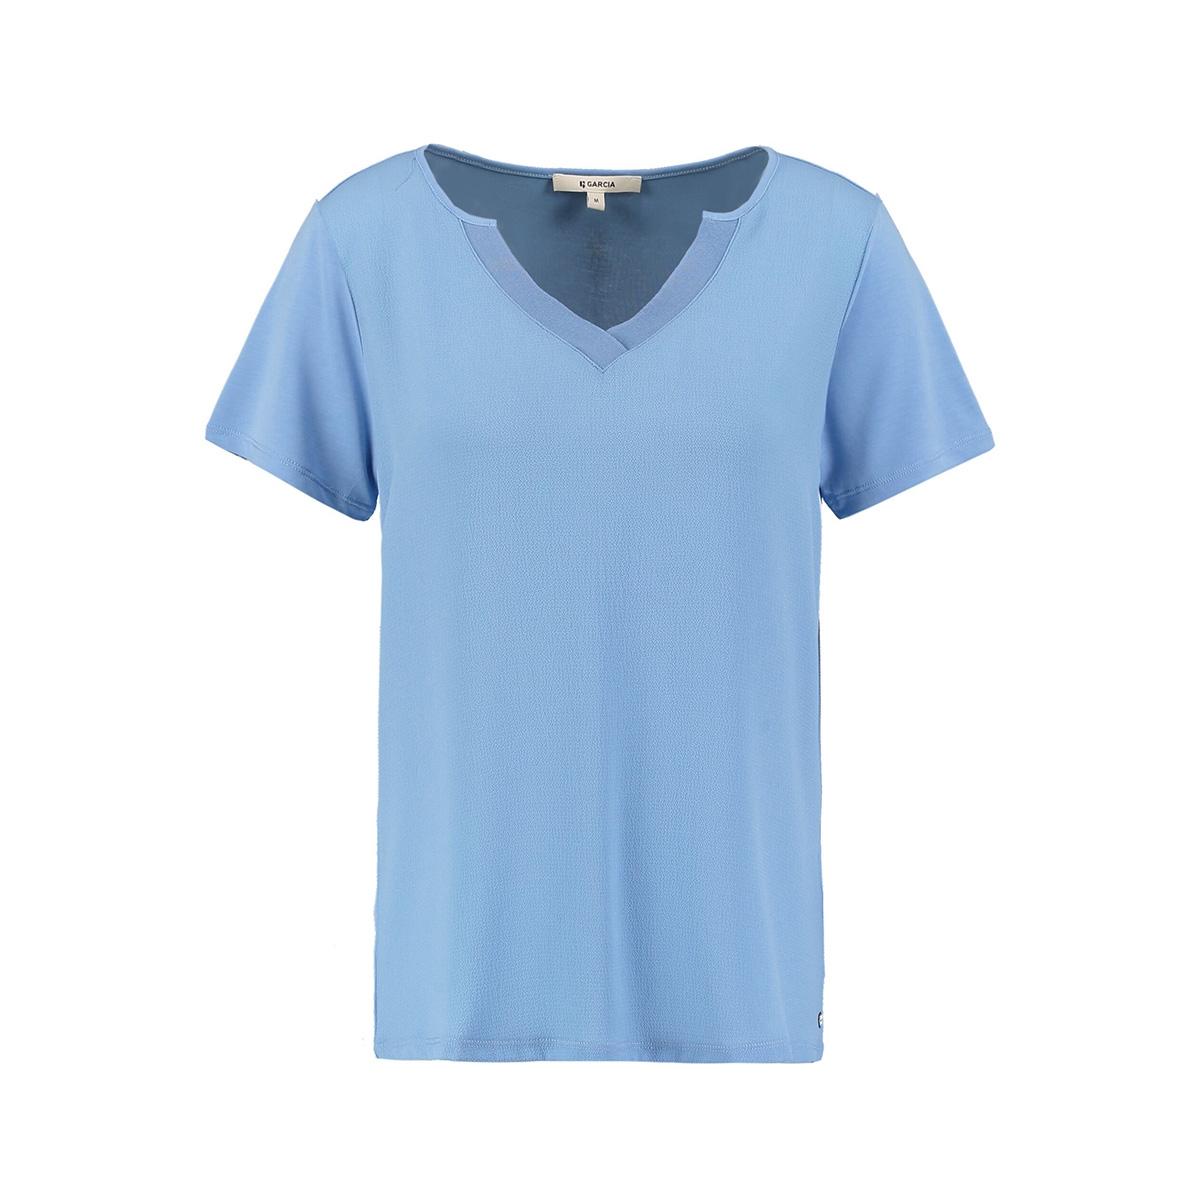 t shirt gs000102 garcia t-shirt 2129